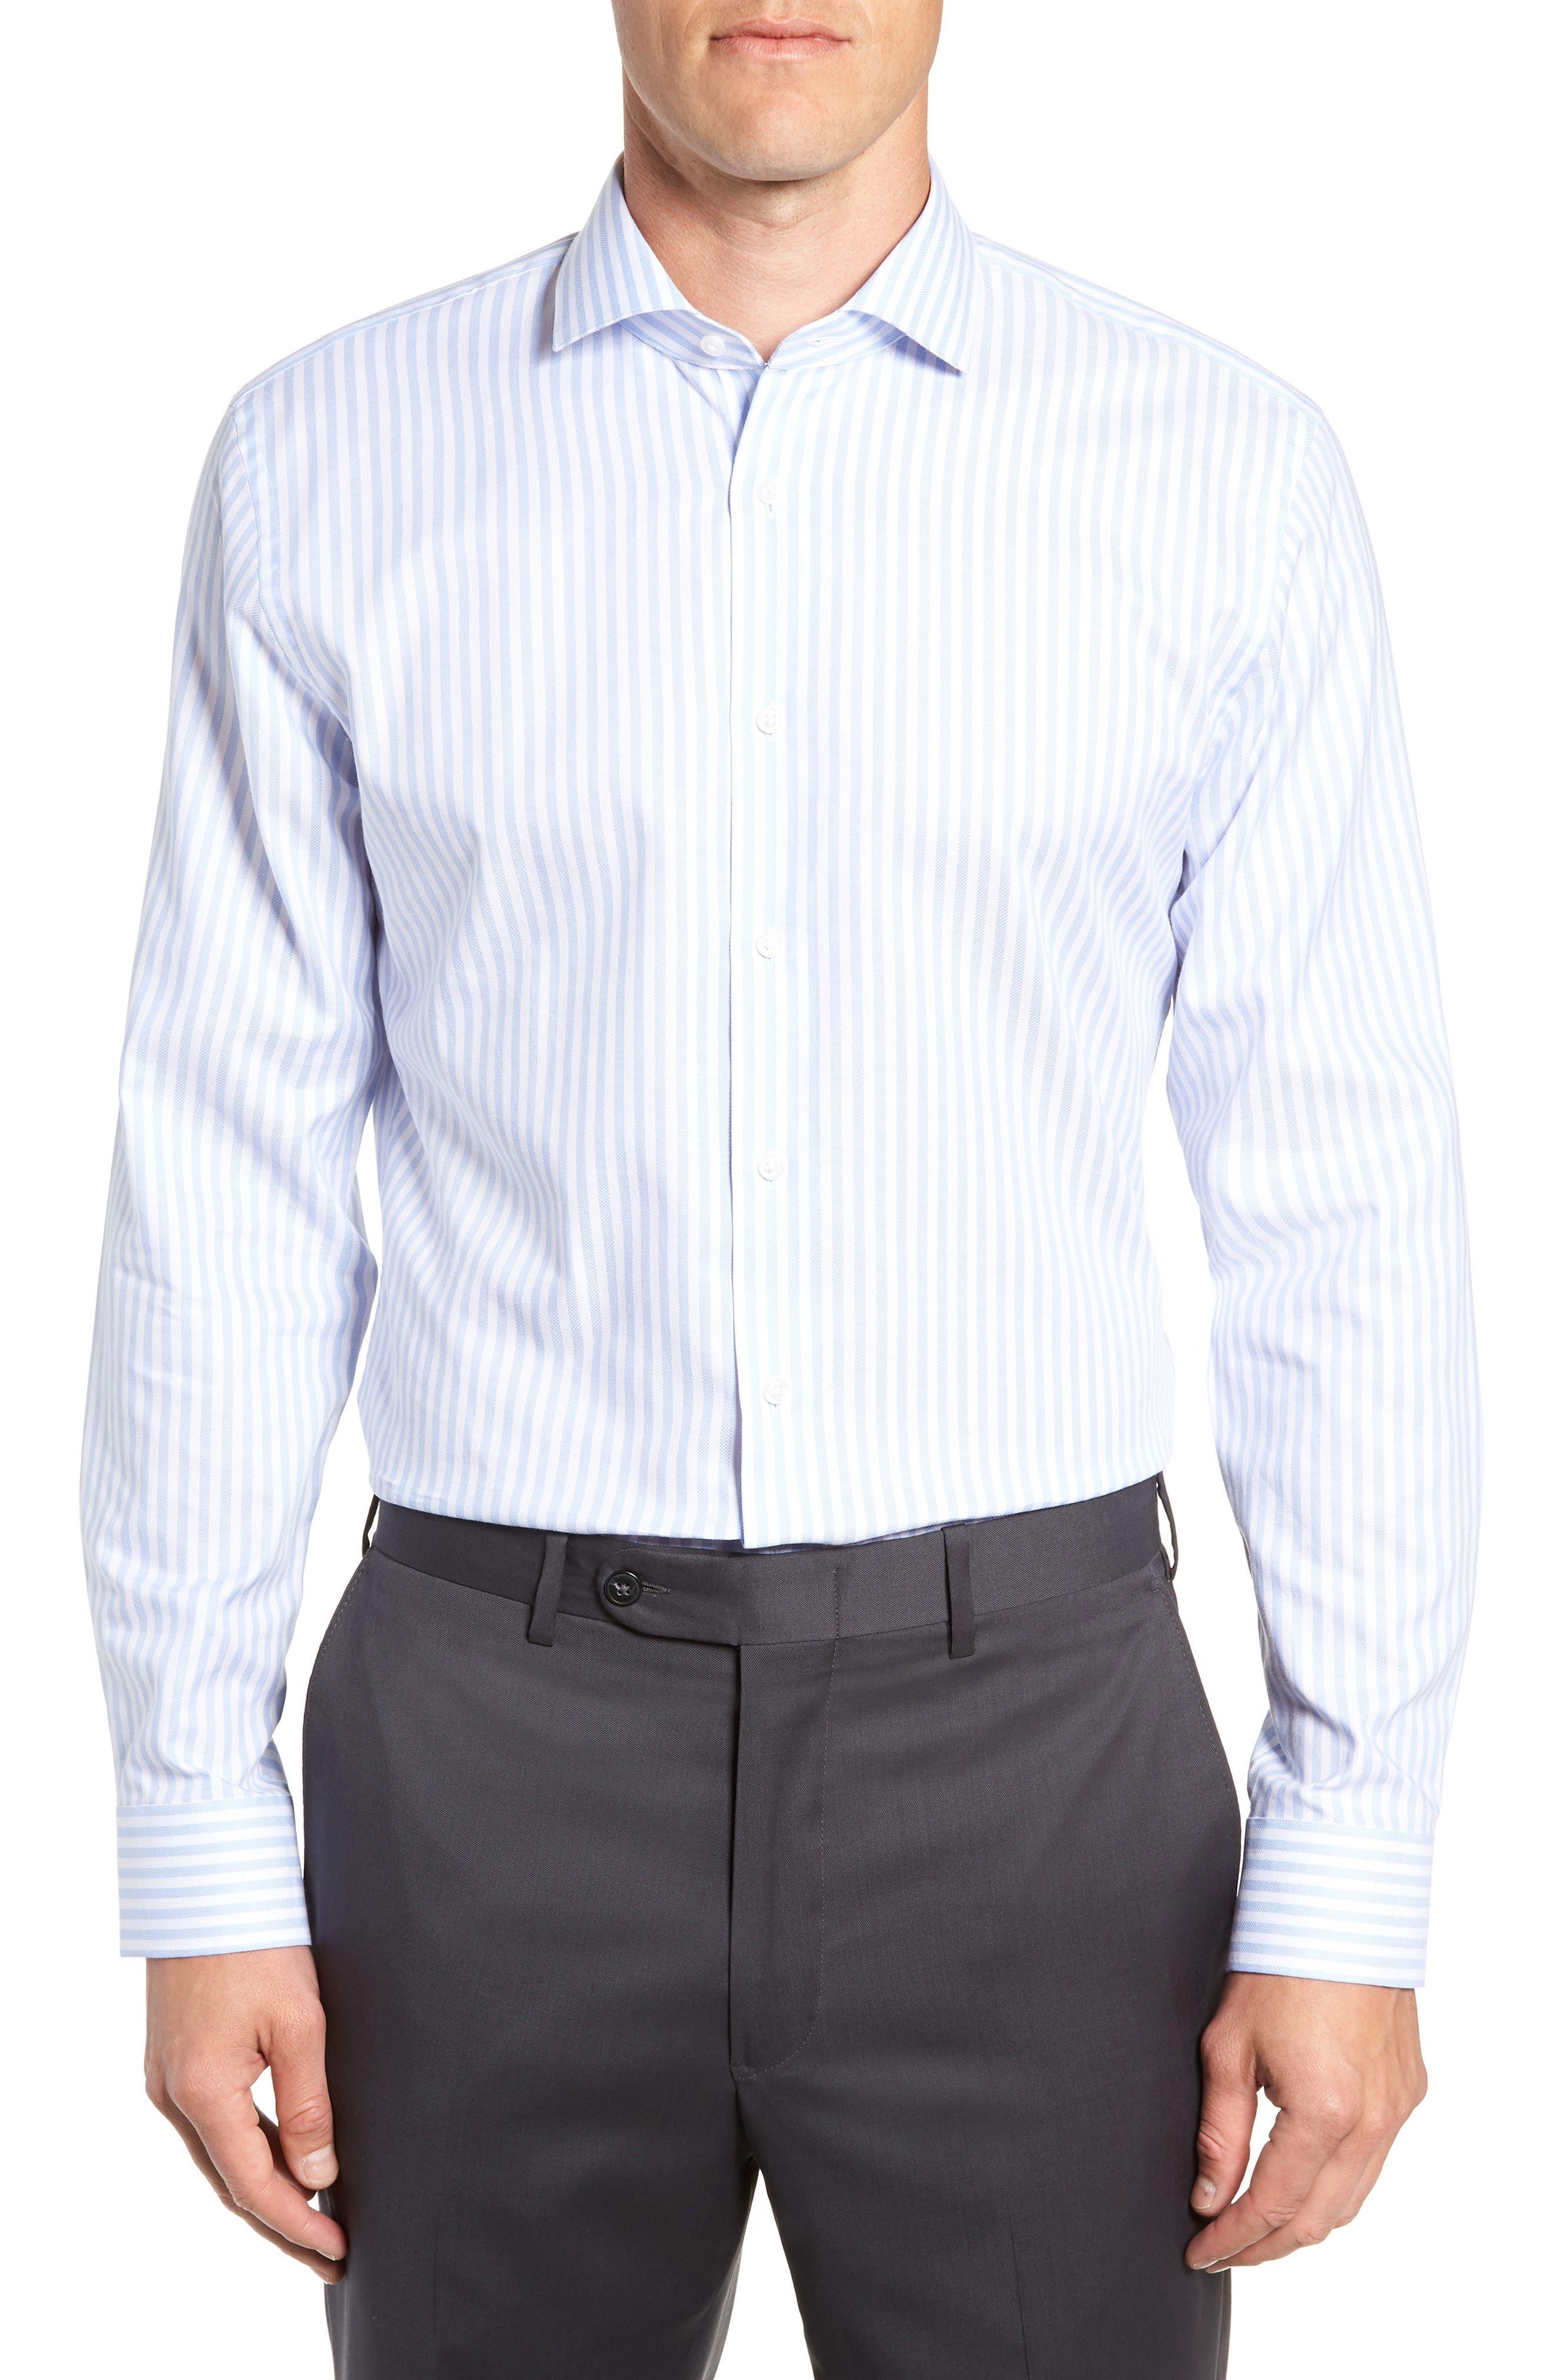 Trim Fit Stripe Dress Shirt, Main, color, BLUE STORK